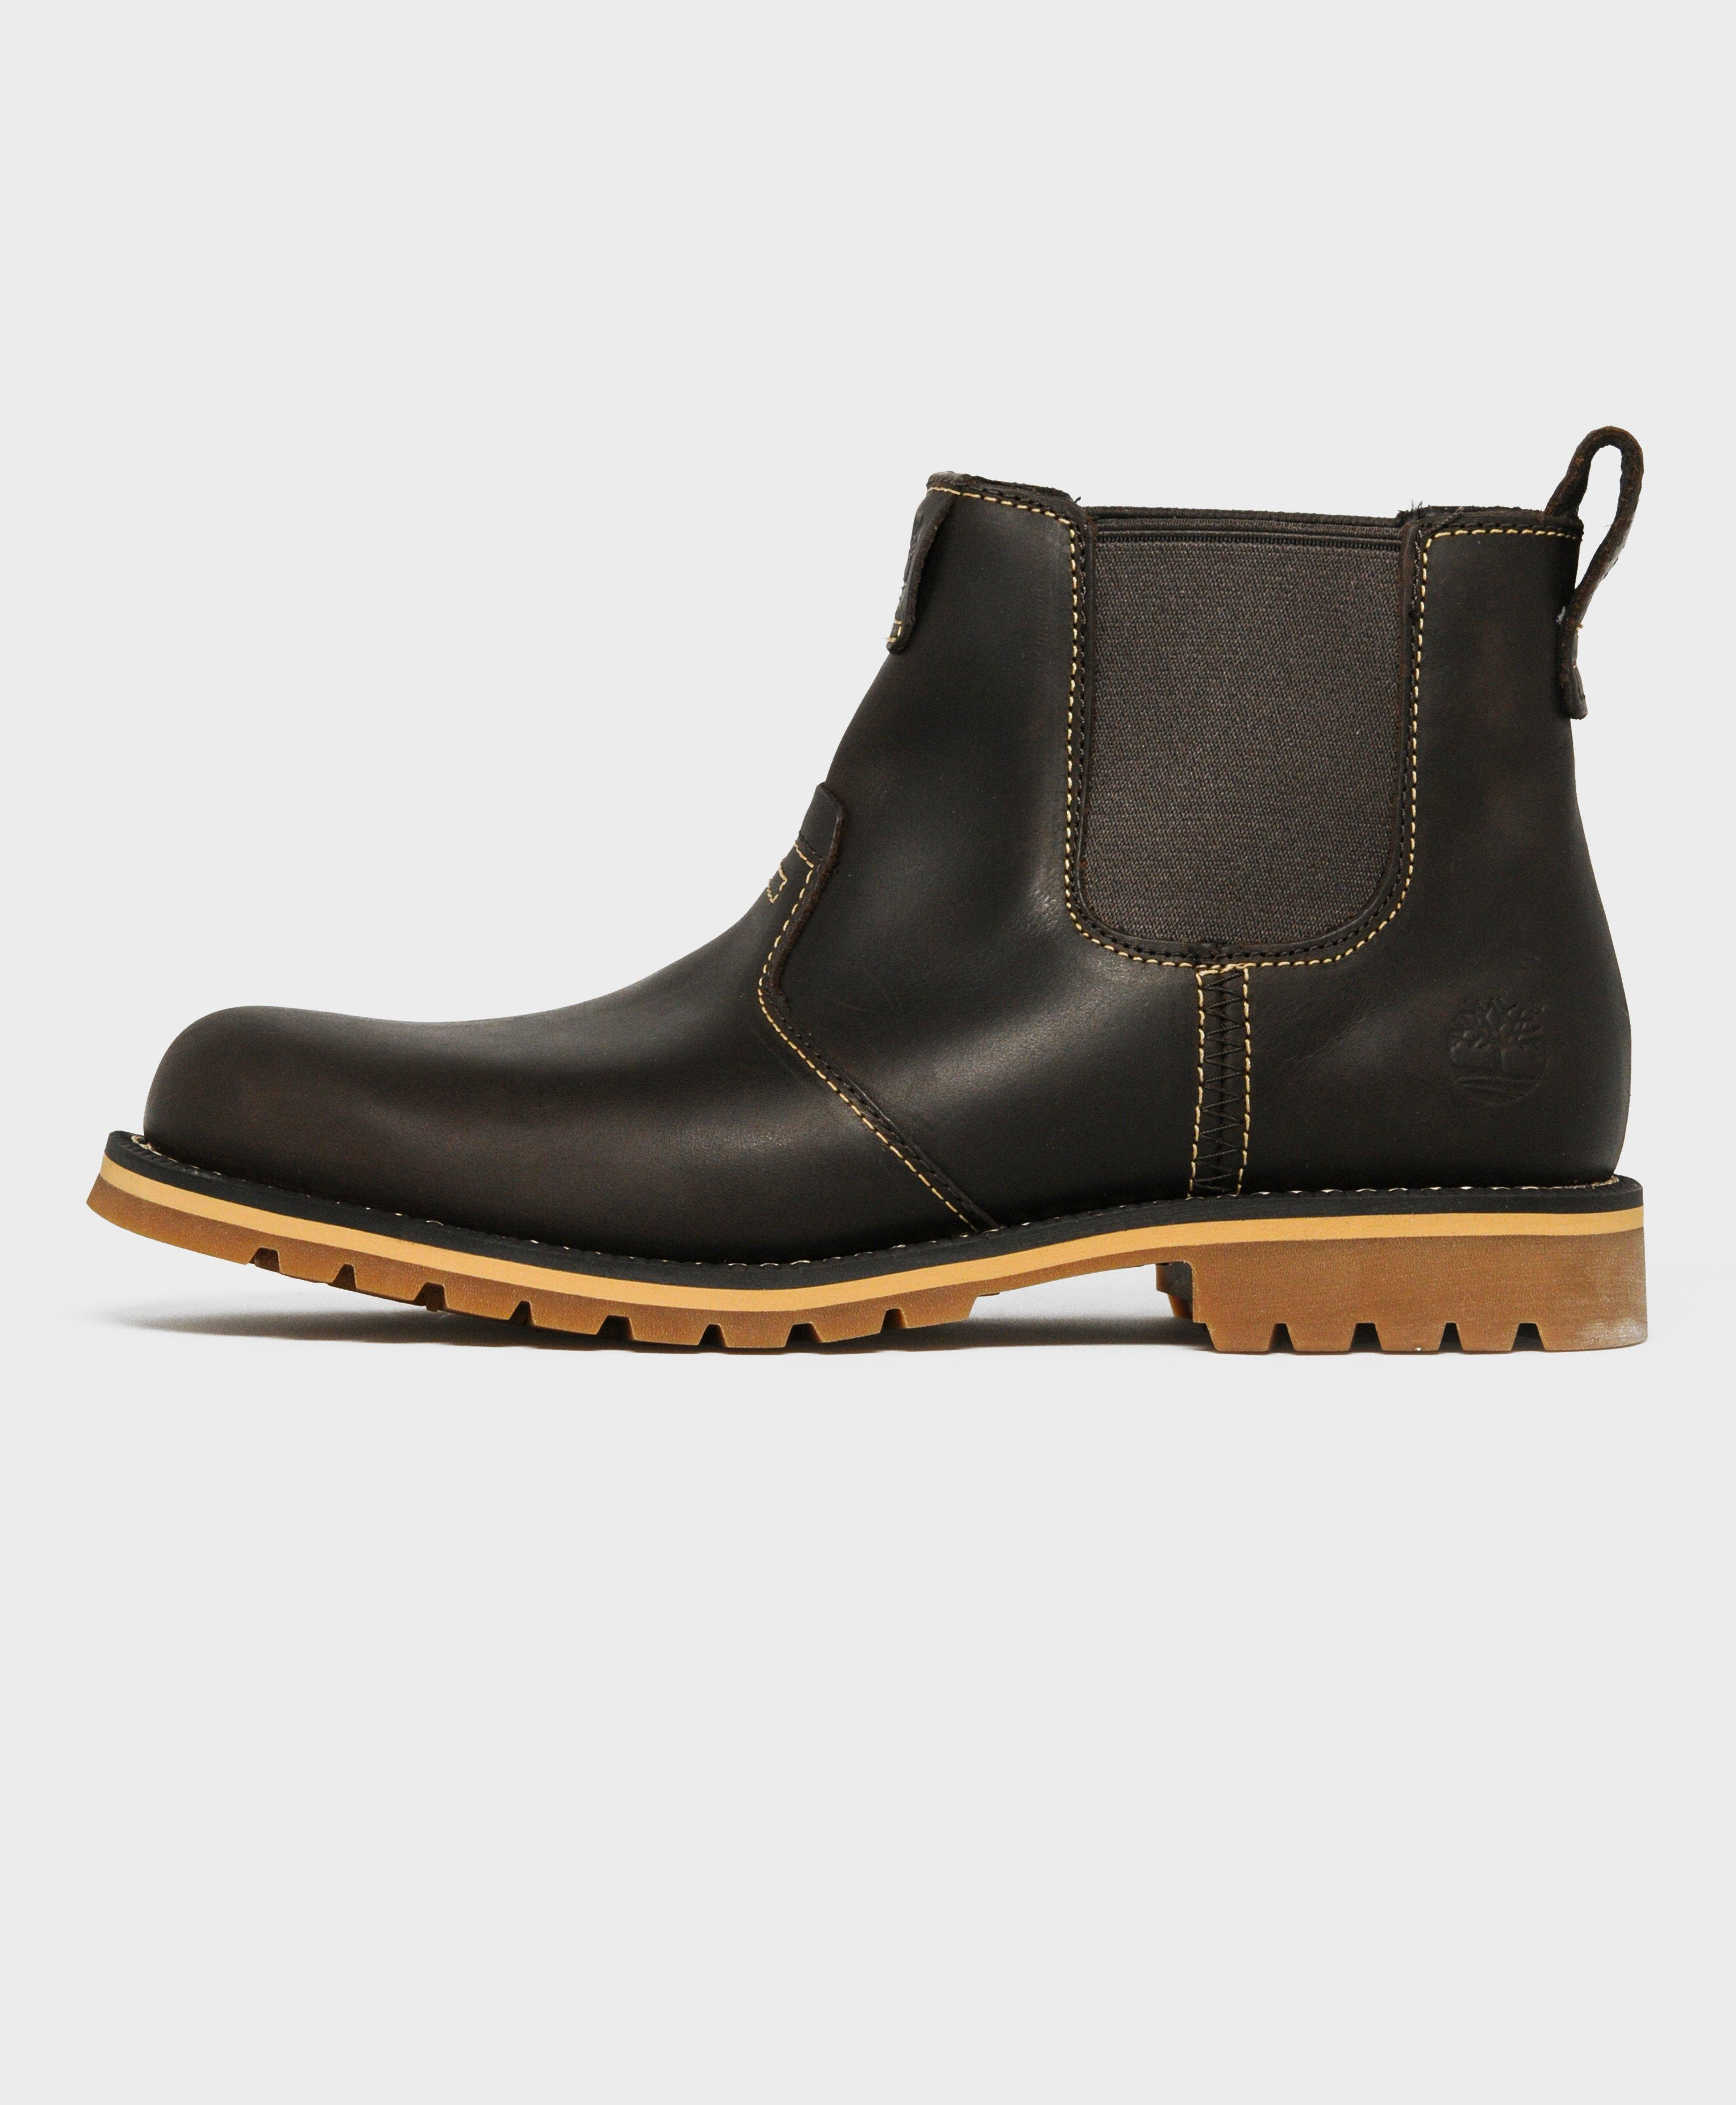 lyst timberland grantly chelsea boot in black for men. Black Bedroom Furniture Sets. Home Design Ideas